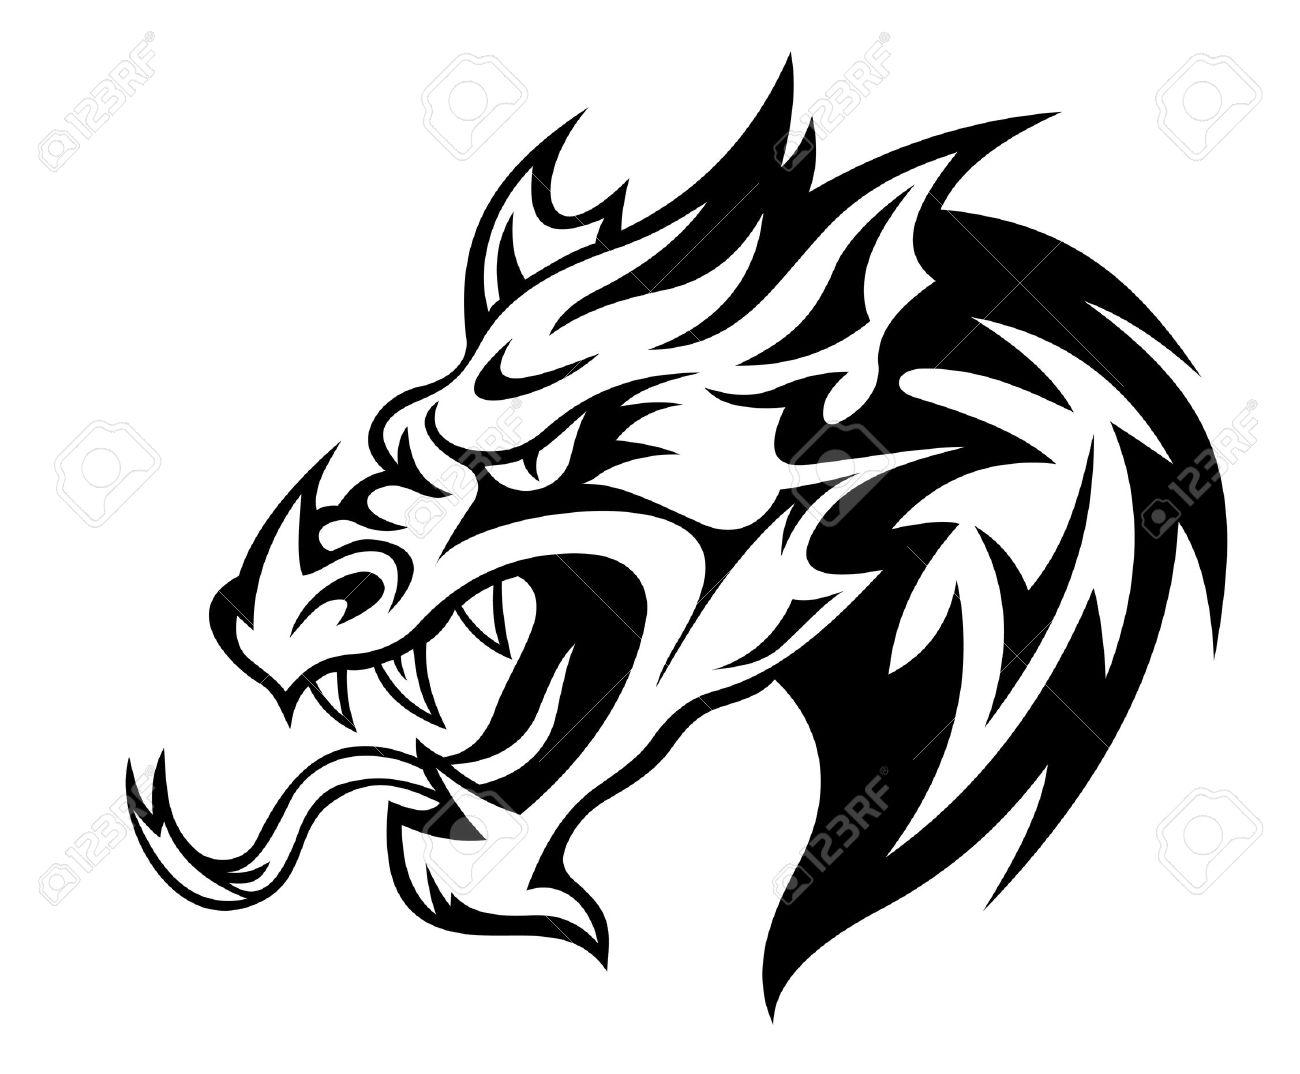 1300x1074 Dragon Head Clipart Black And White